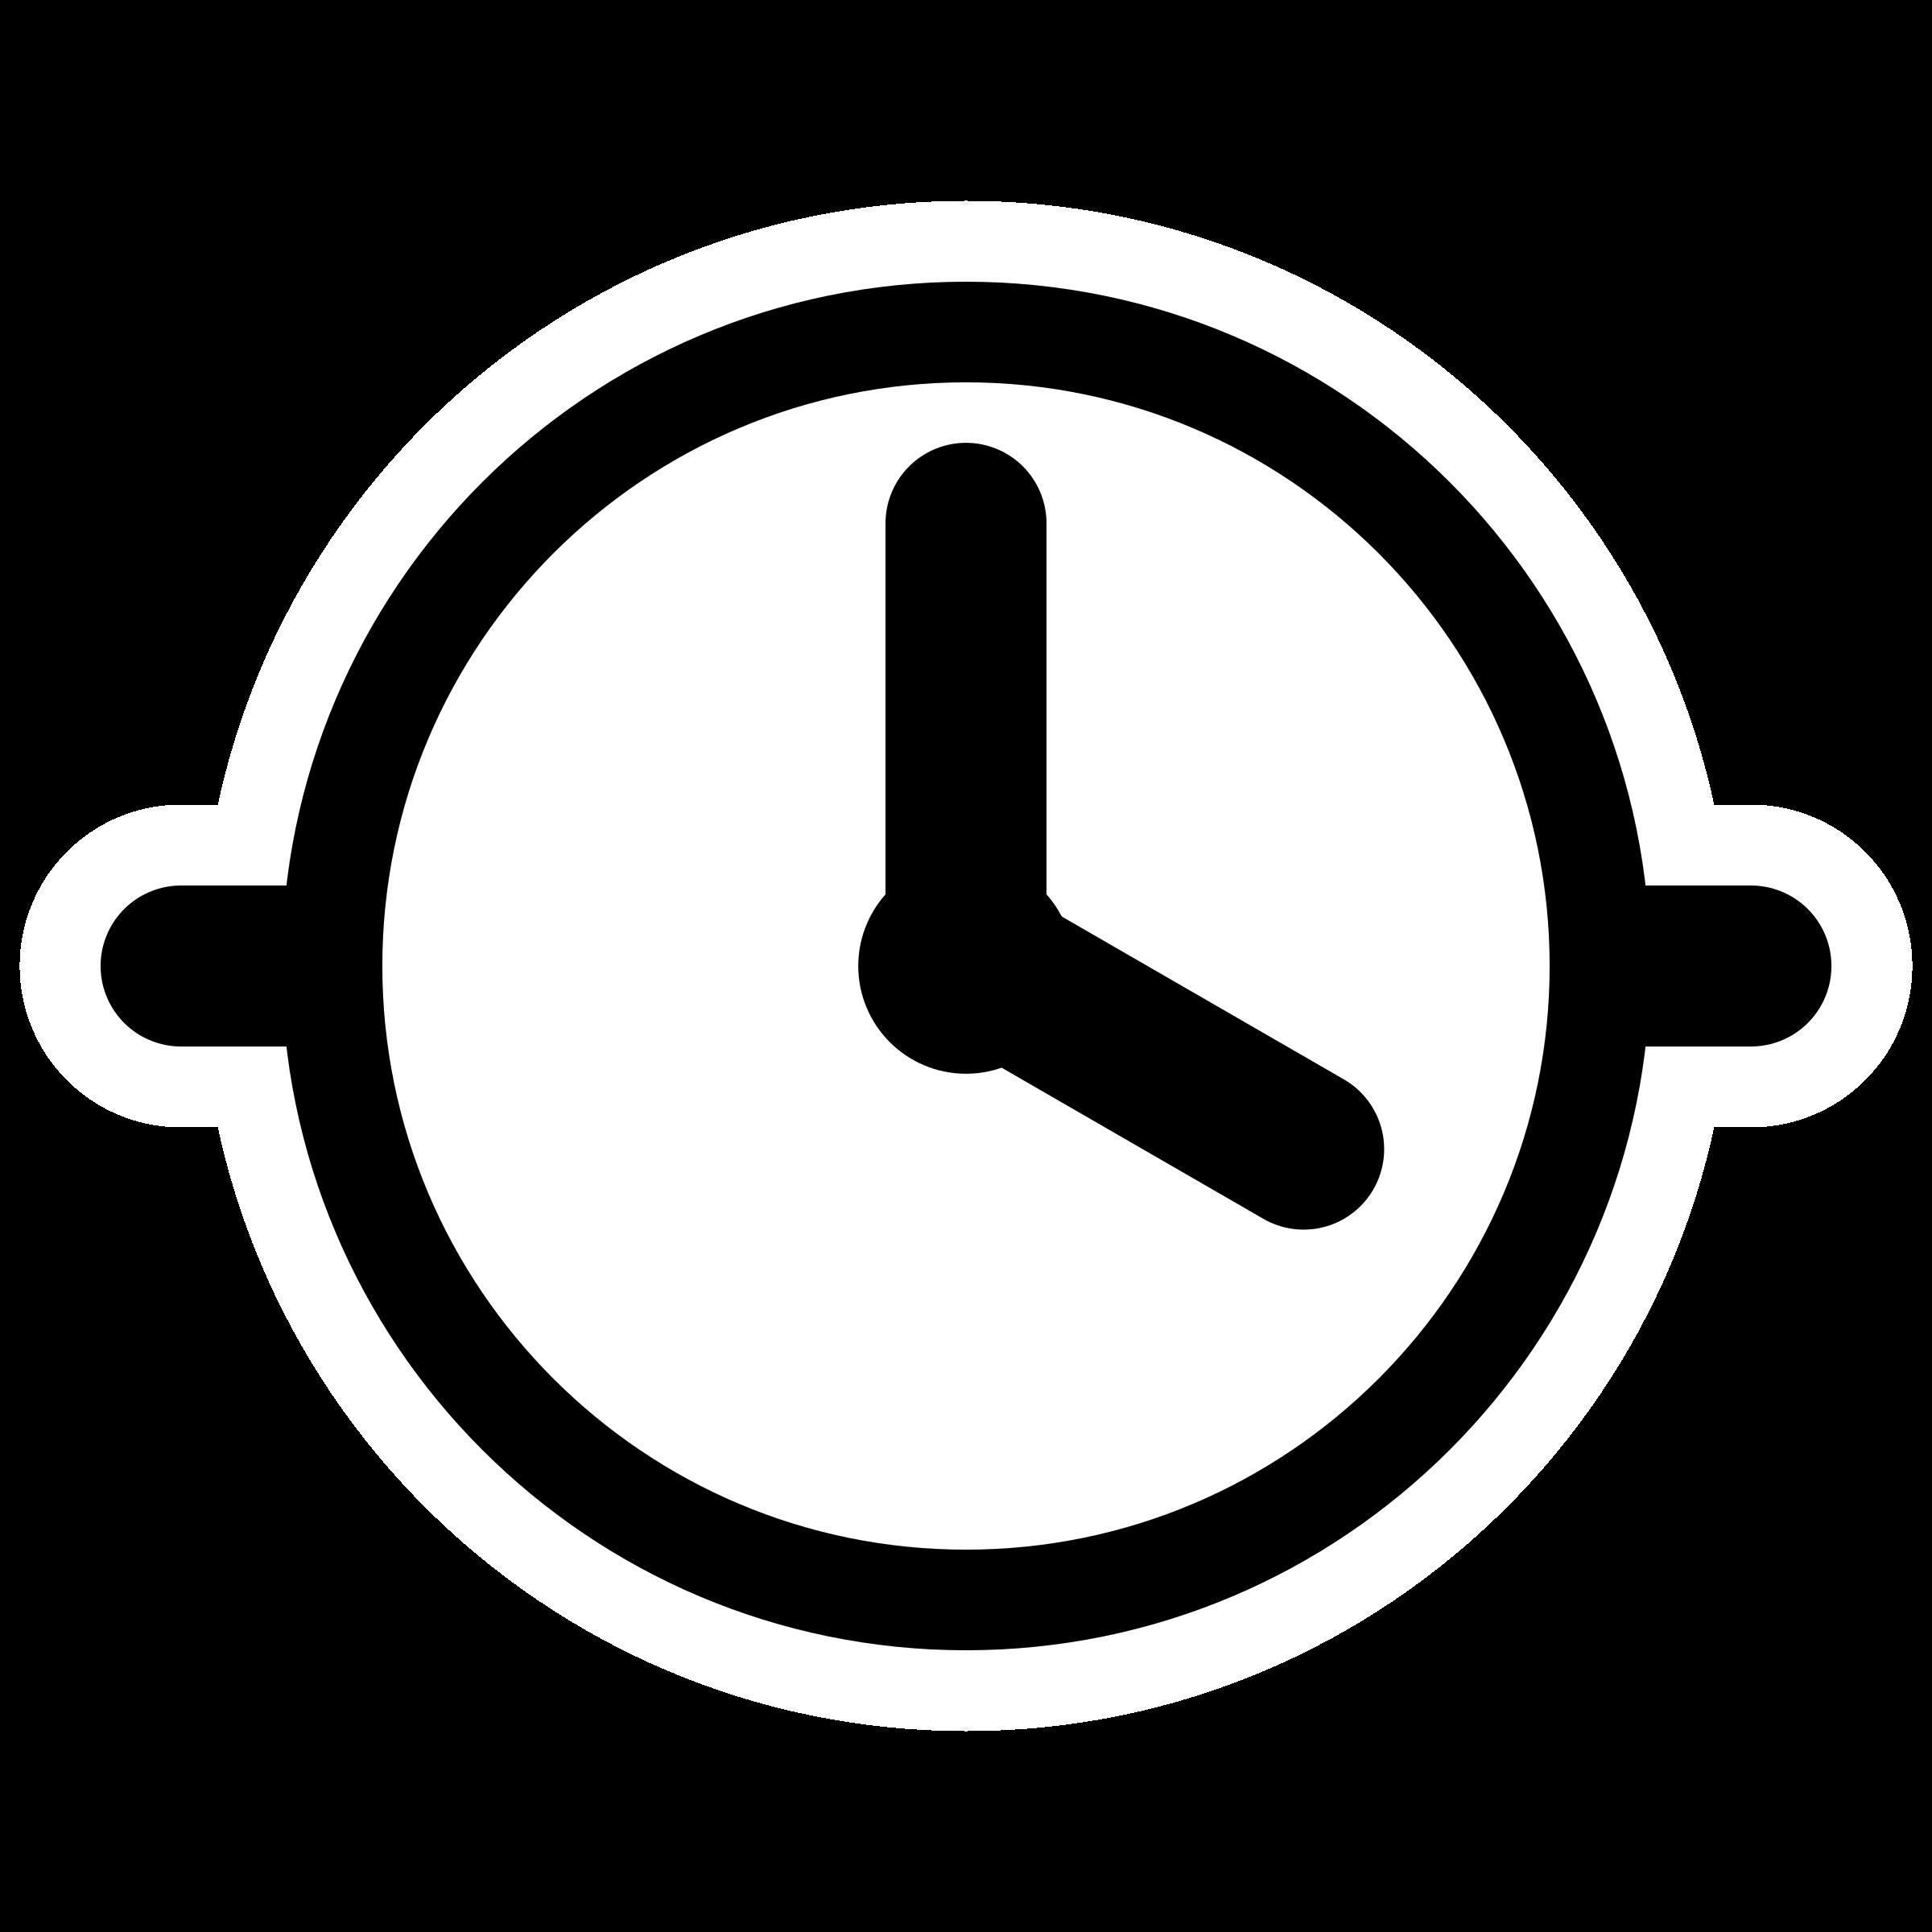 Mono Timeline By Dannya-mono timeline by dannya-7